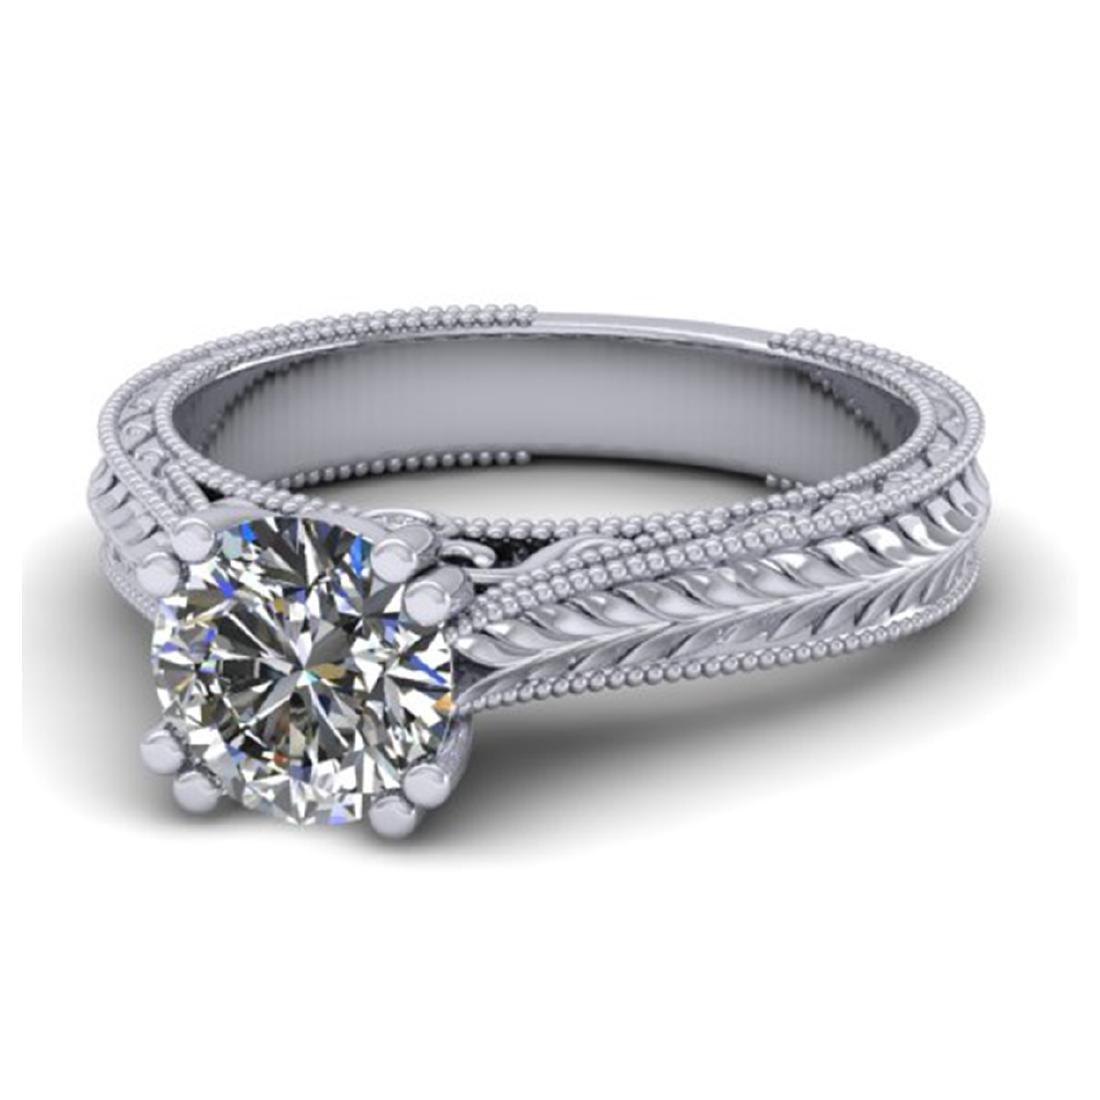 1.06 ctw Solitaire VS/SI Diamond Ring 14K White Gold - - 2